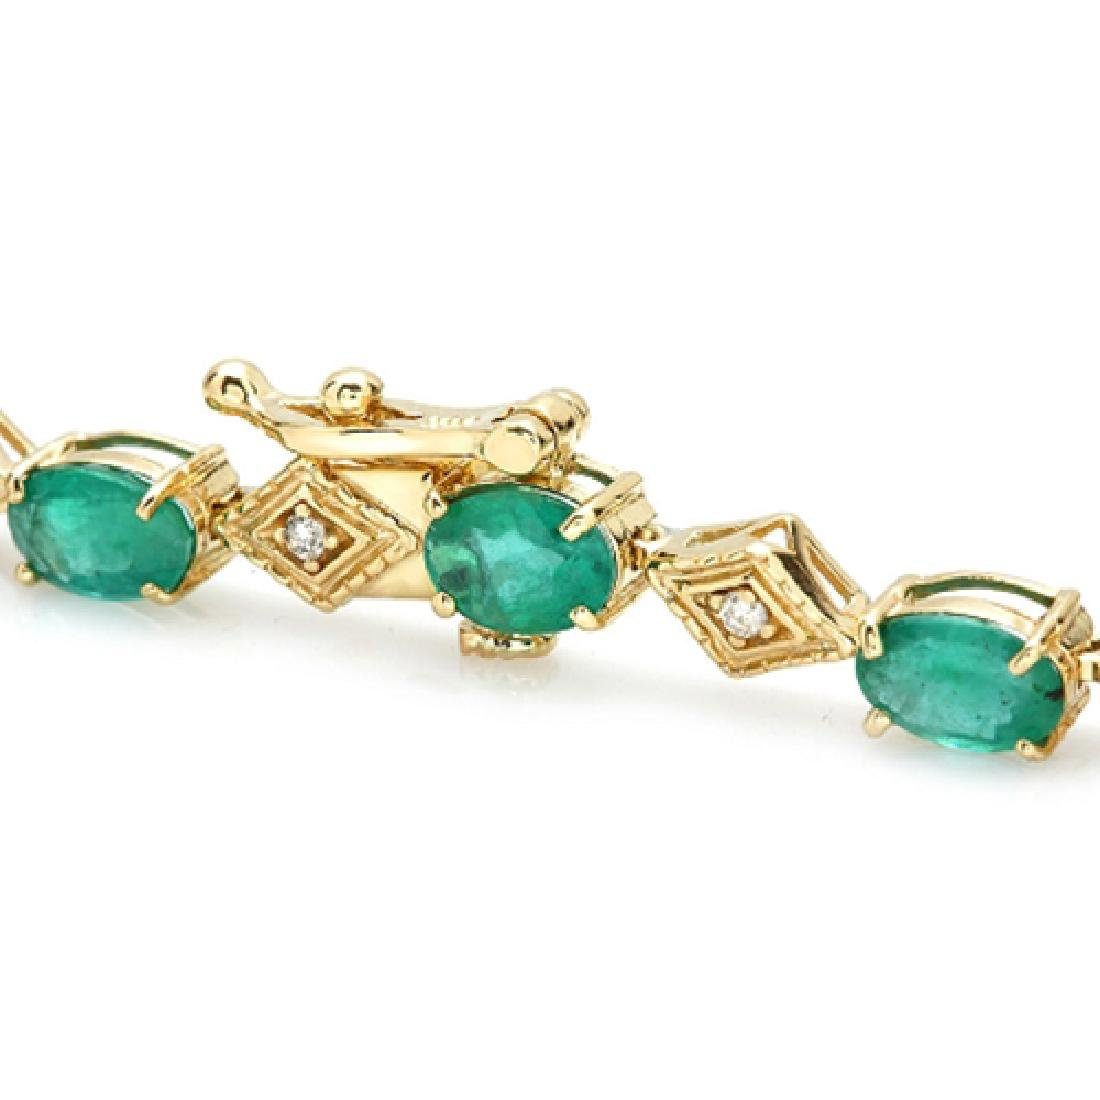 6.17 Carat Natural Emerald 18K Solid Yellow Gold - 2